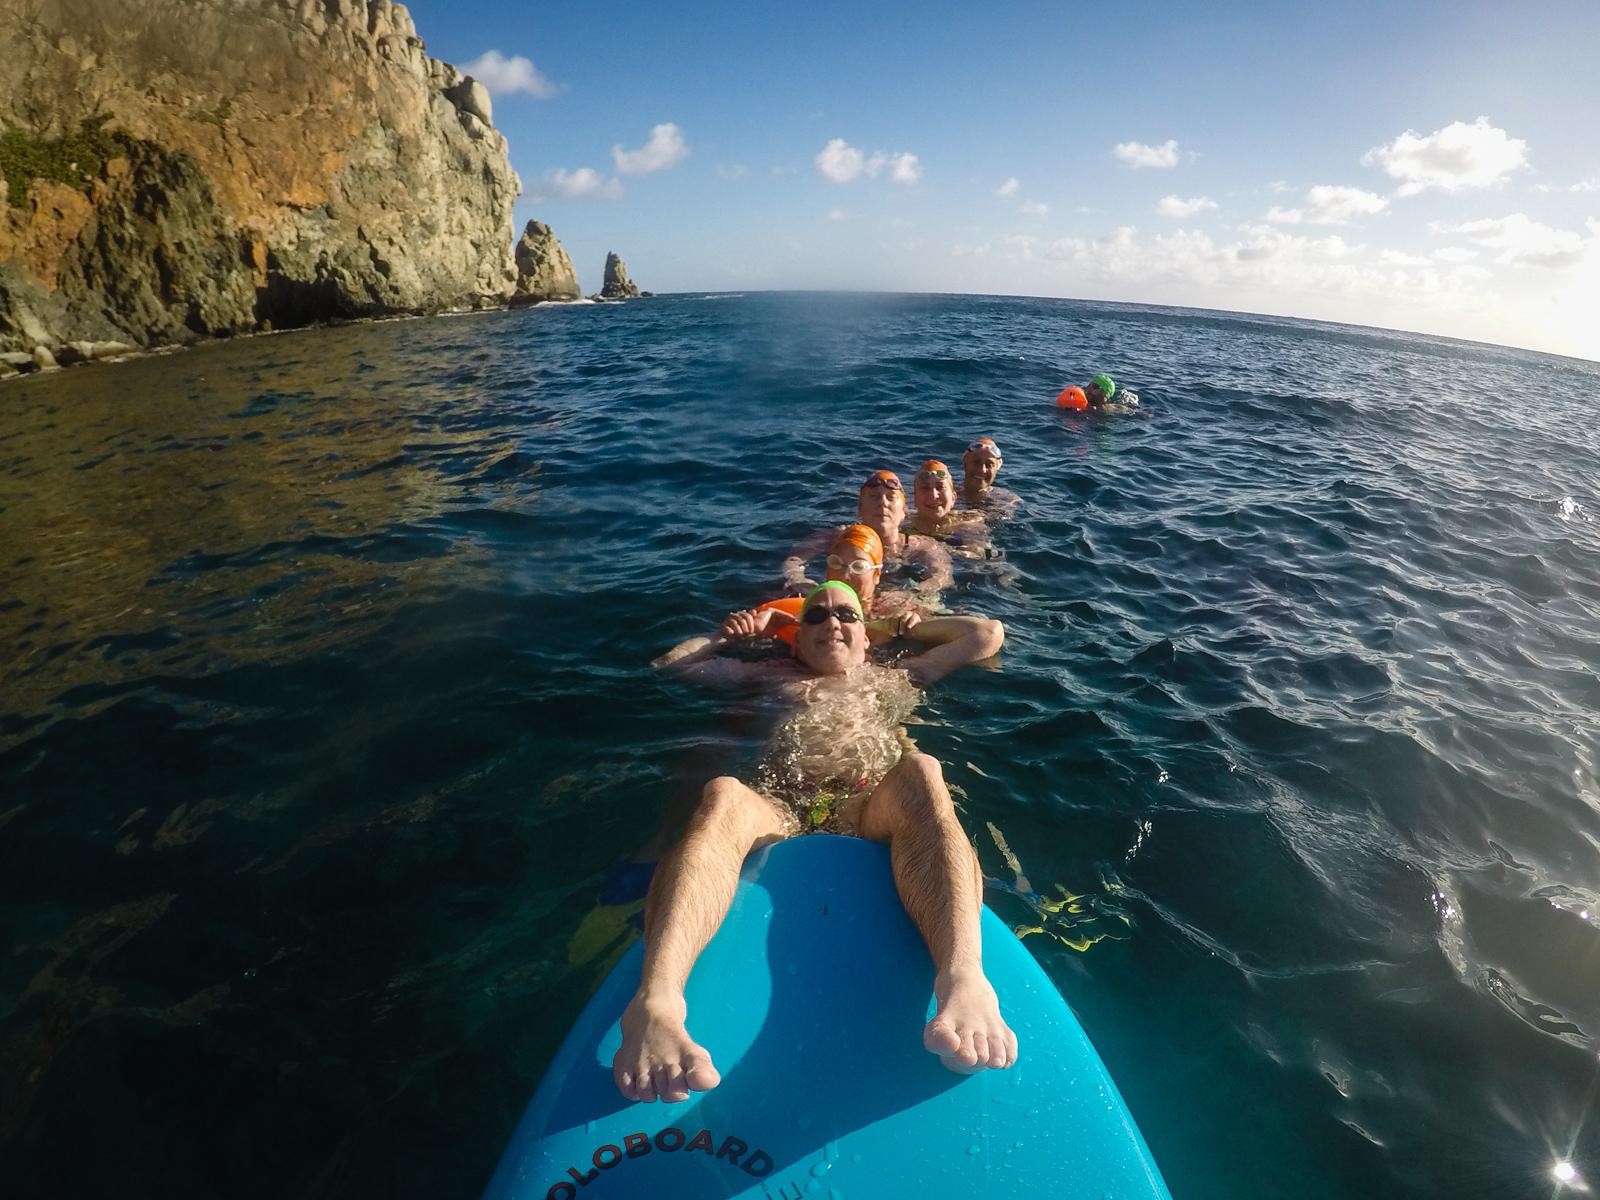 Spontaneous marine conga line on our Cooper Island swim.